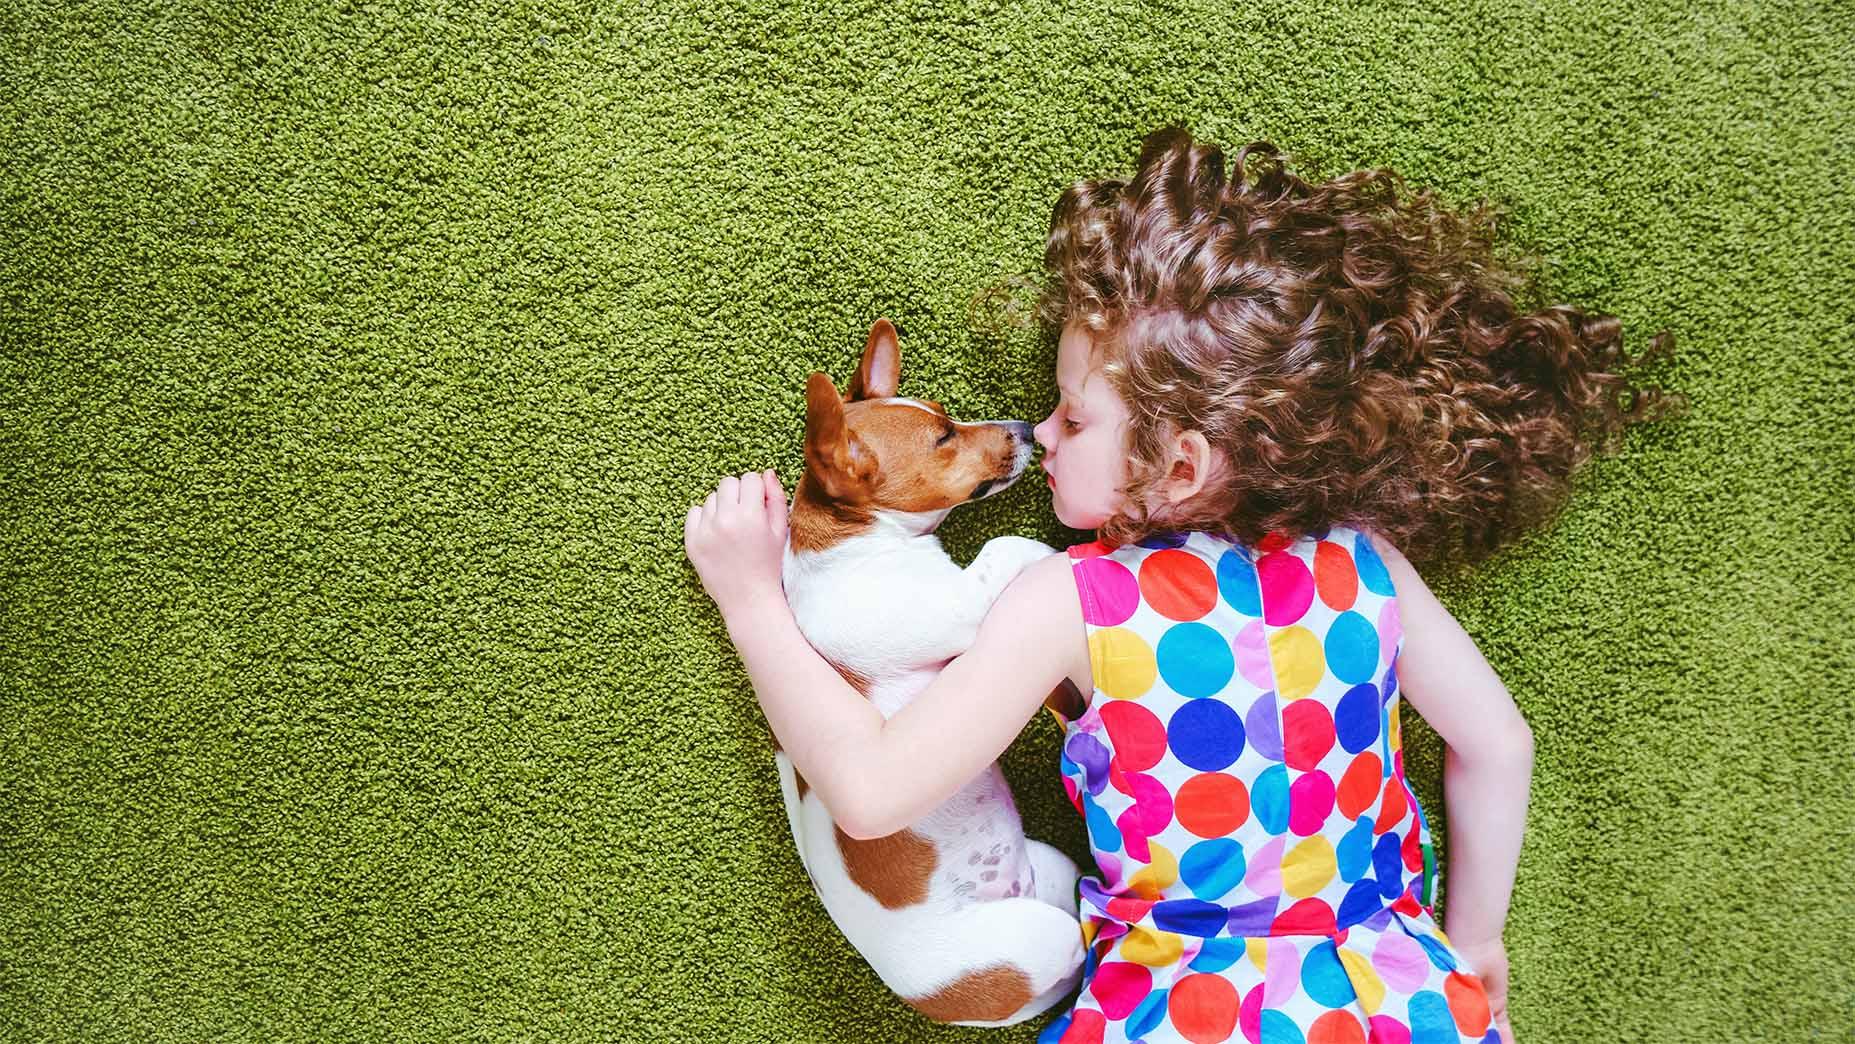 LCS clean carpet girl dog